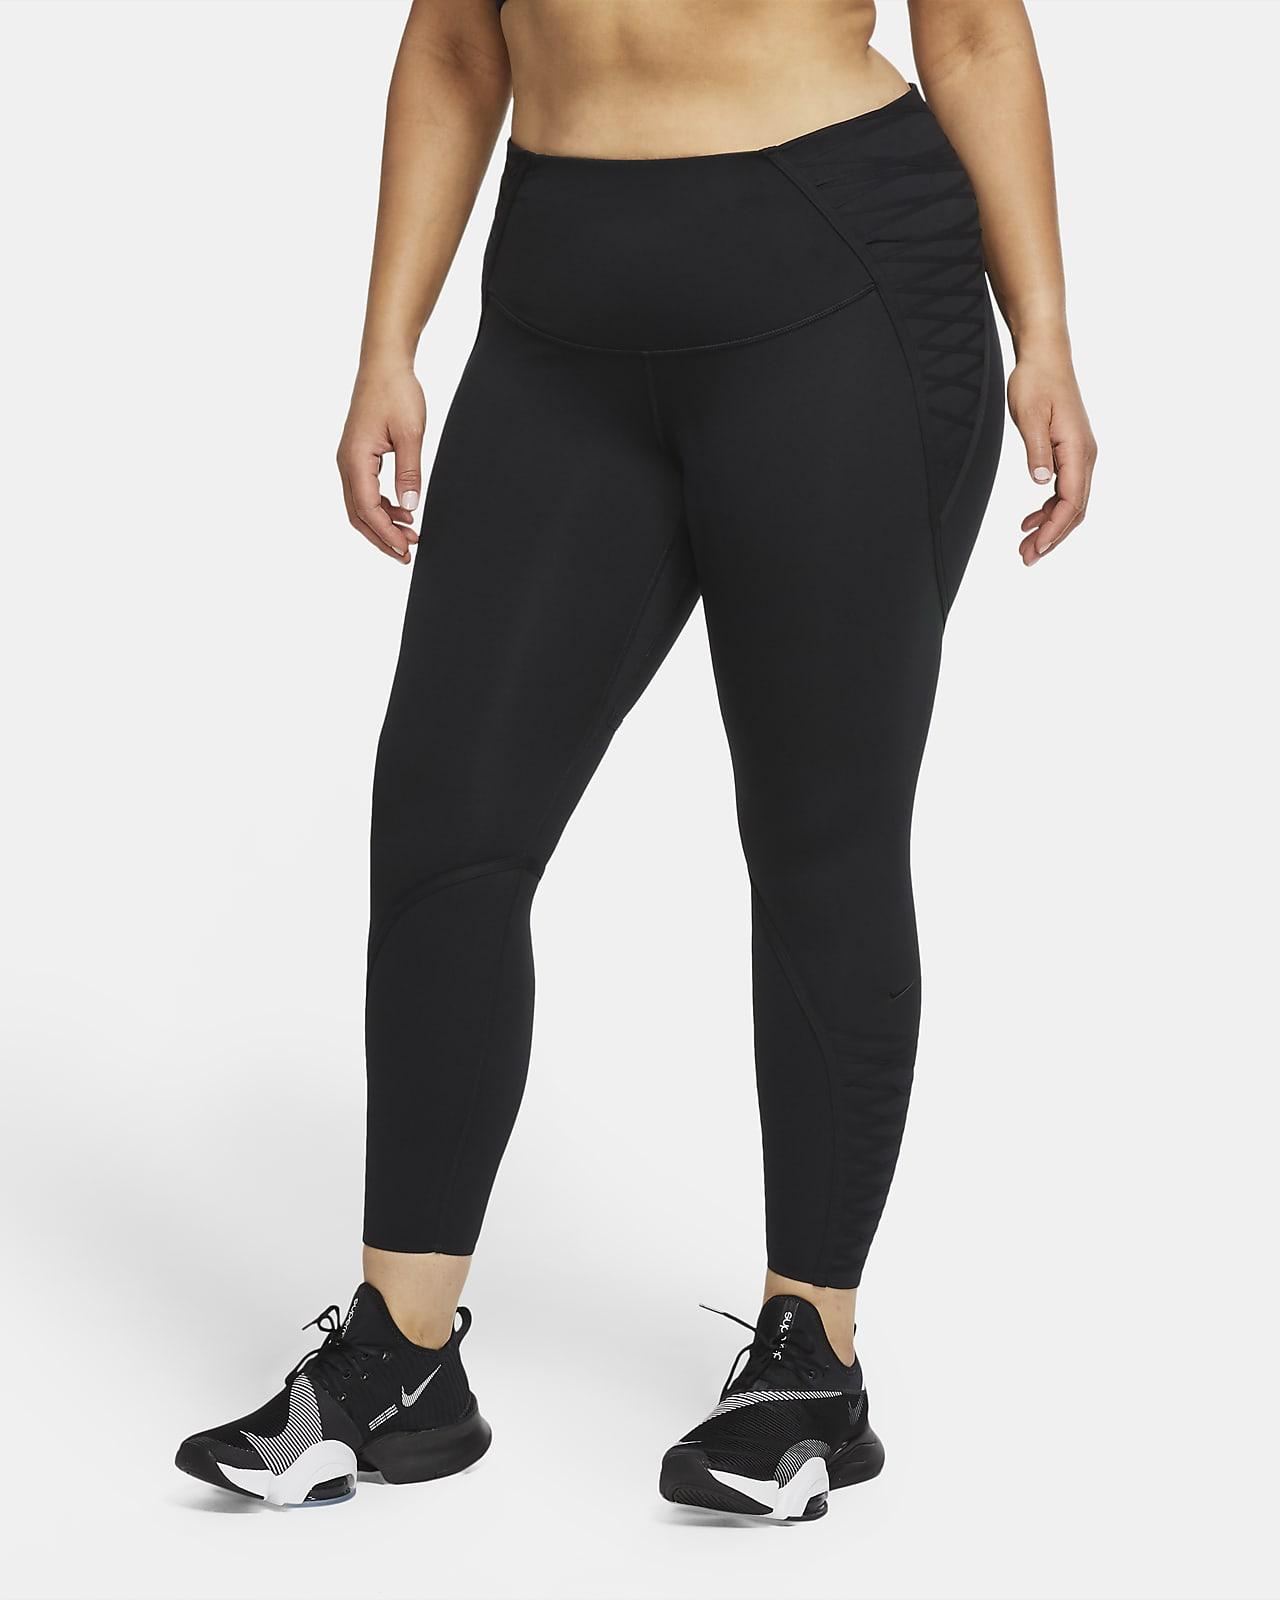 Nike One Luxe Women's 7/8 Laced Leggings (Plus Size)